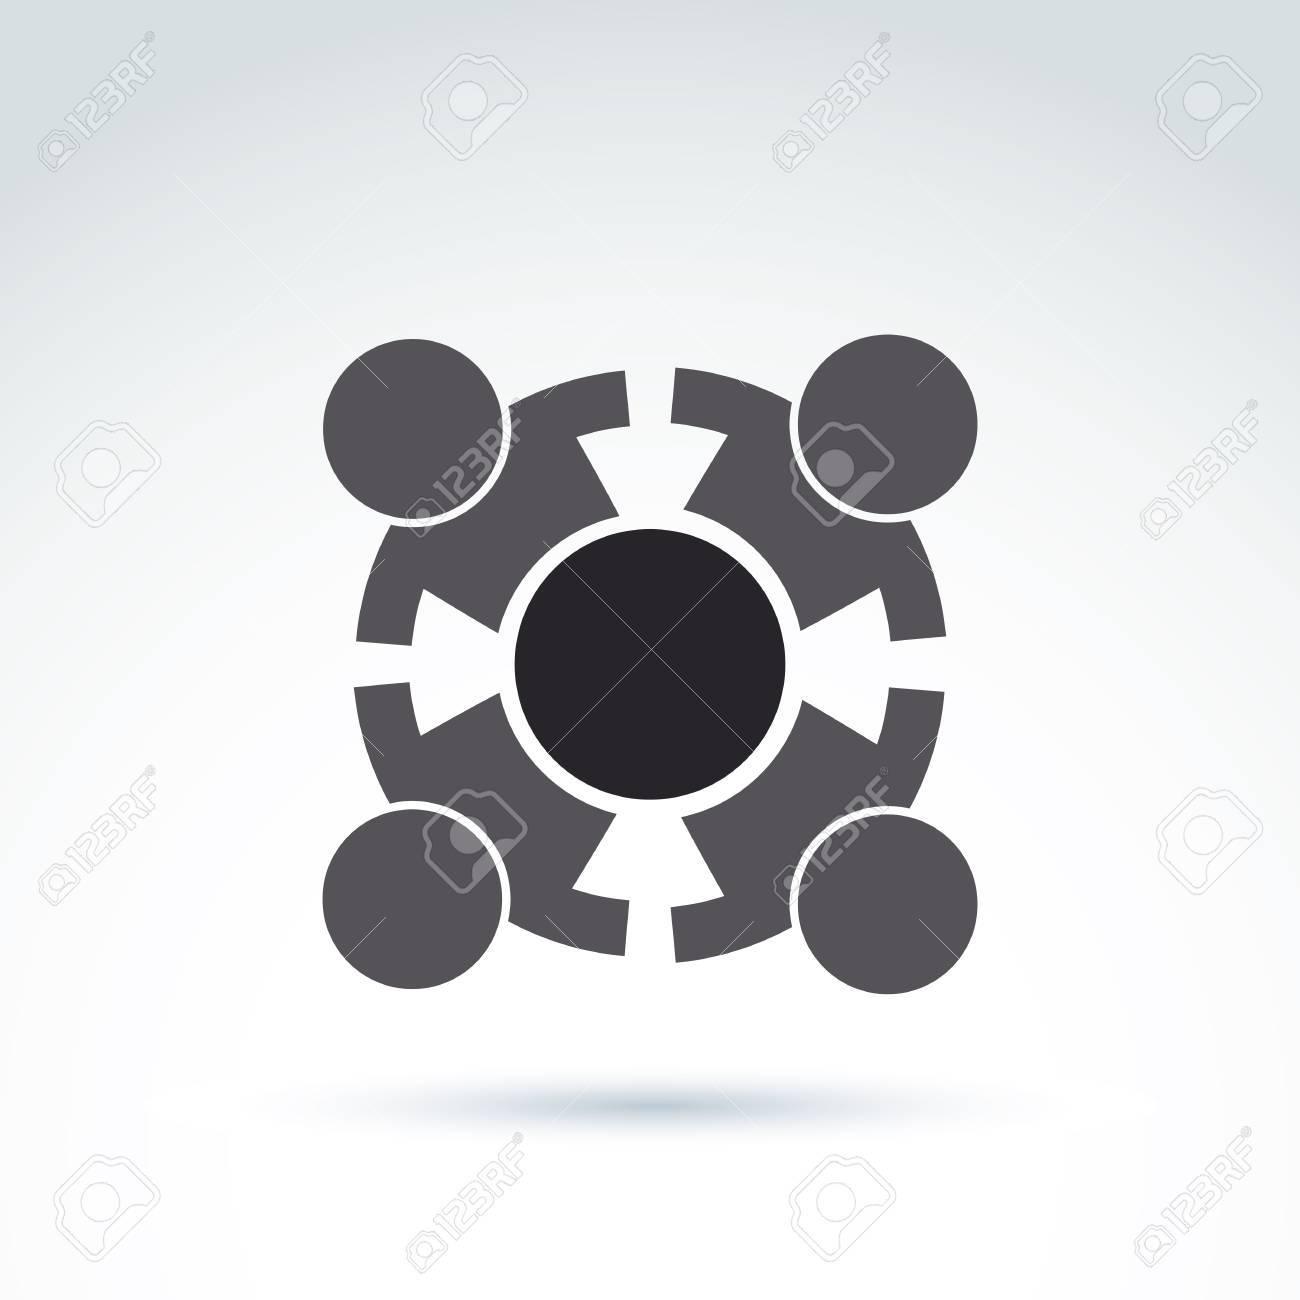 Teamwork and business team and friendship icon social group teamwork and business team and friendship icon social group organization conceptual unusual symbol buycottarizona